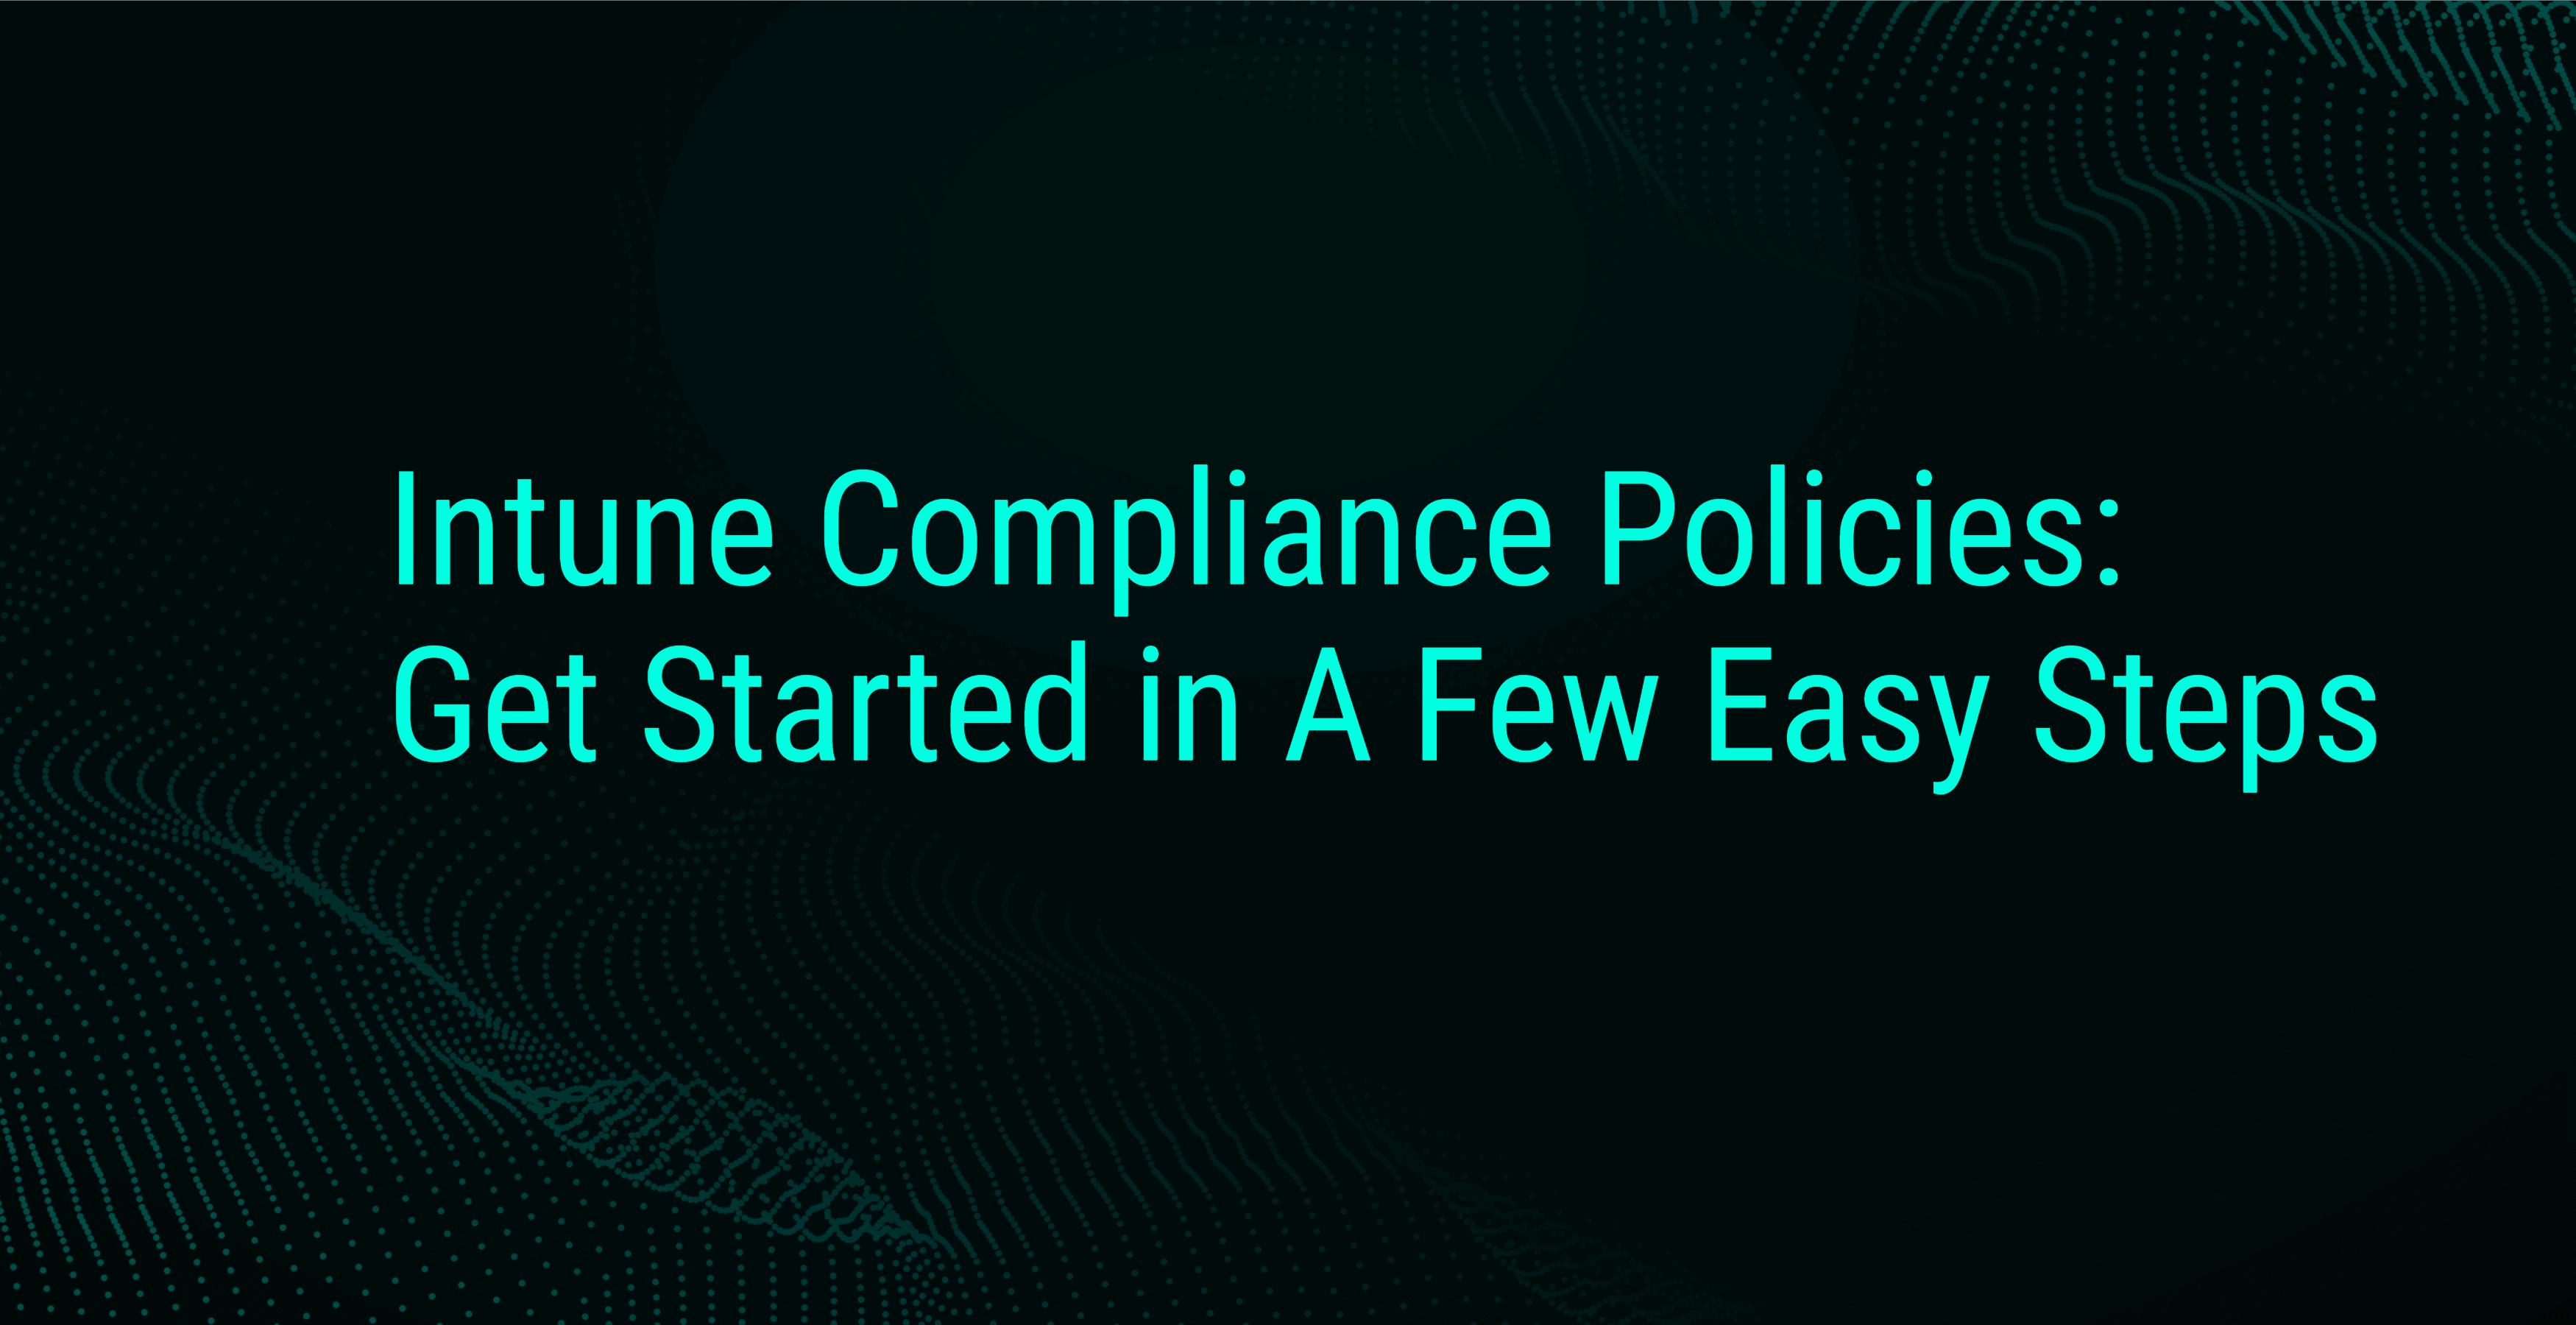 Intune Compliance Policies Hero